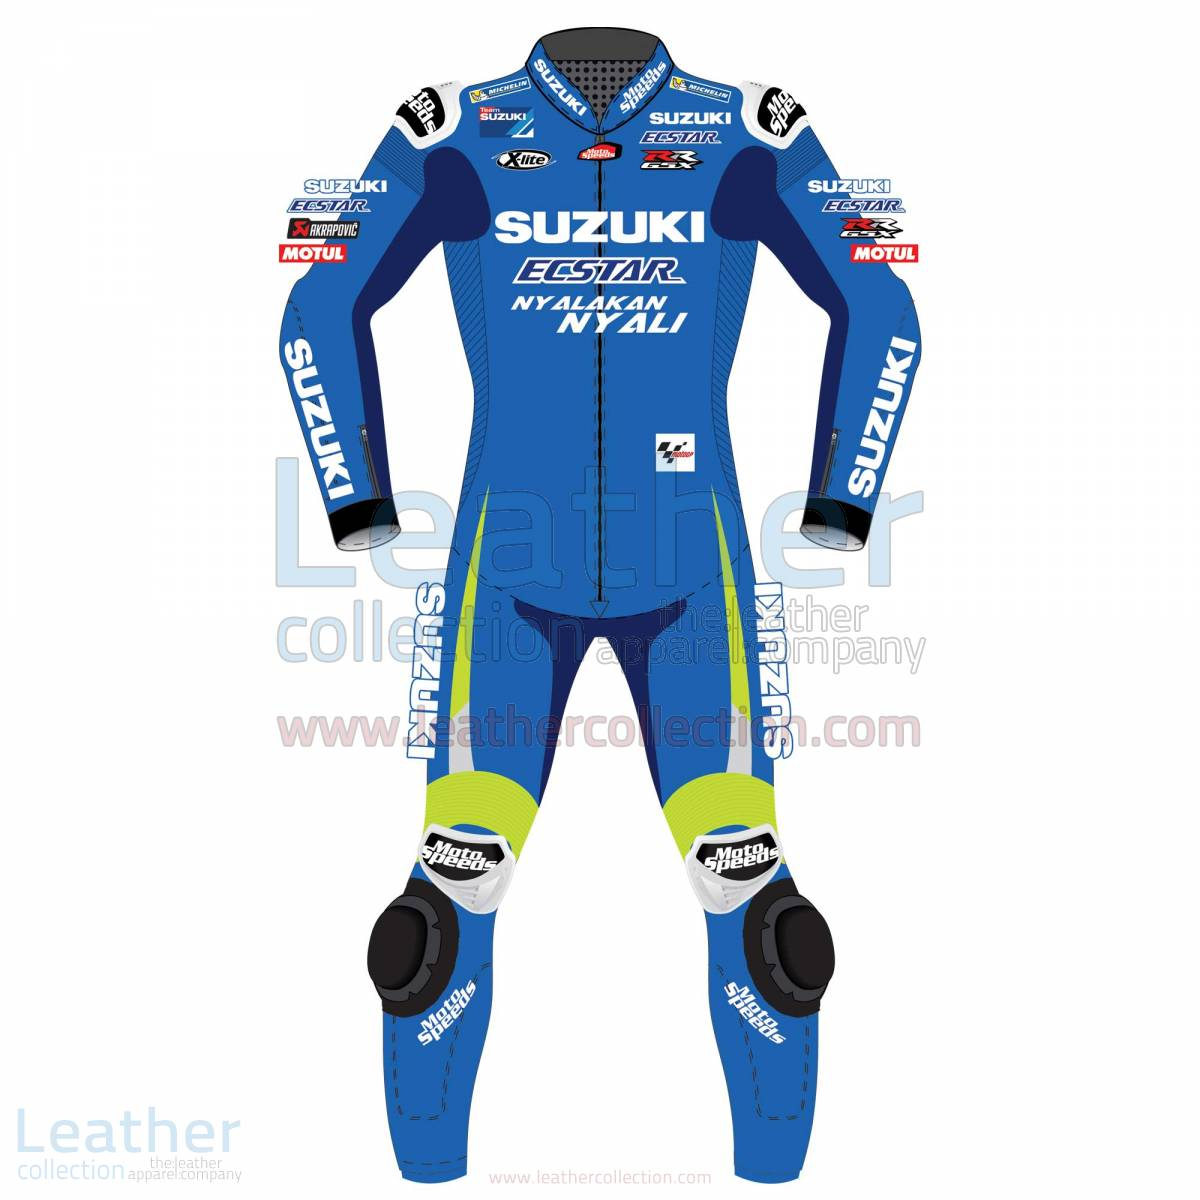 Suzuki racing suit